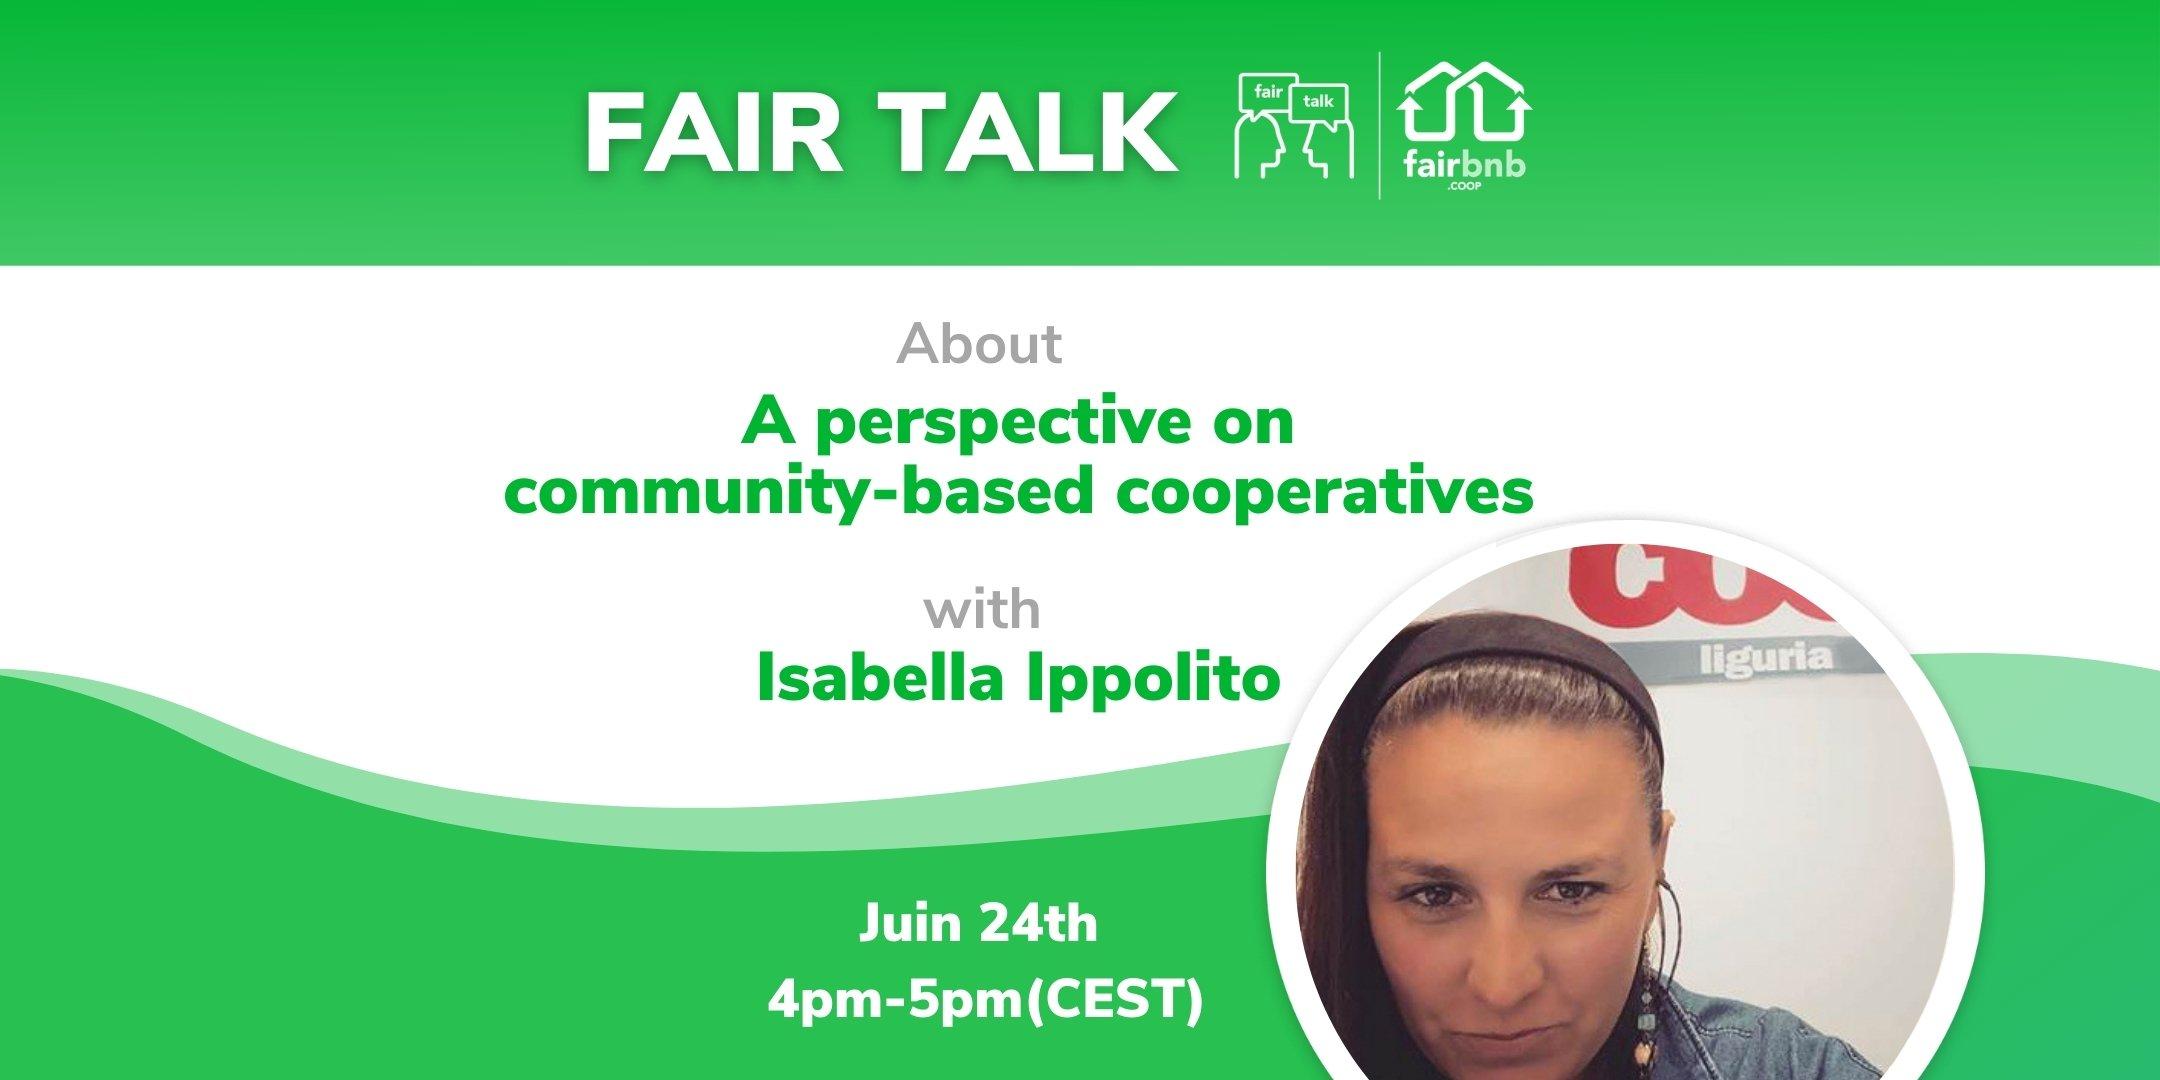 Fair talk new platform coop